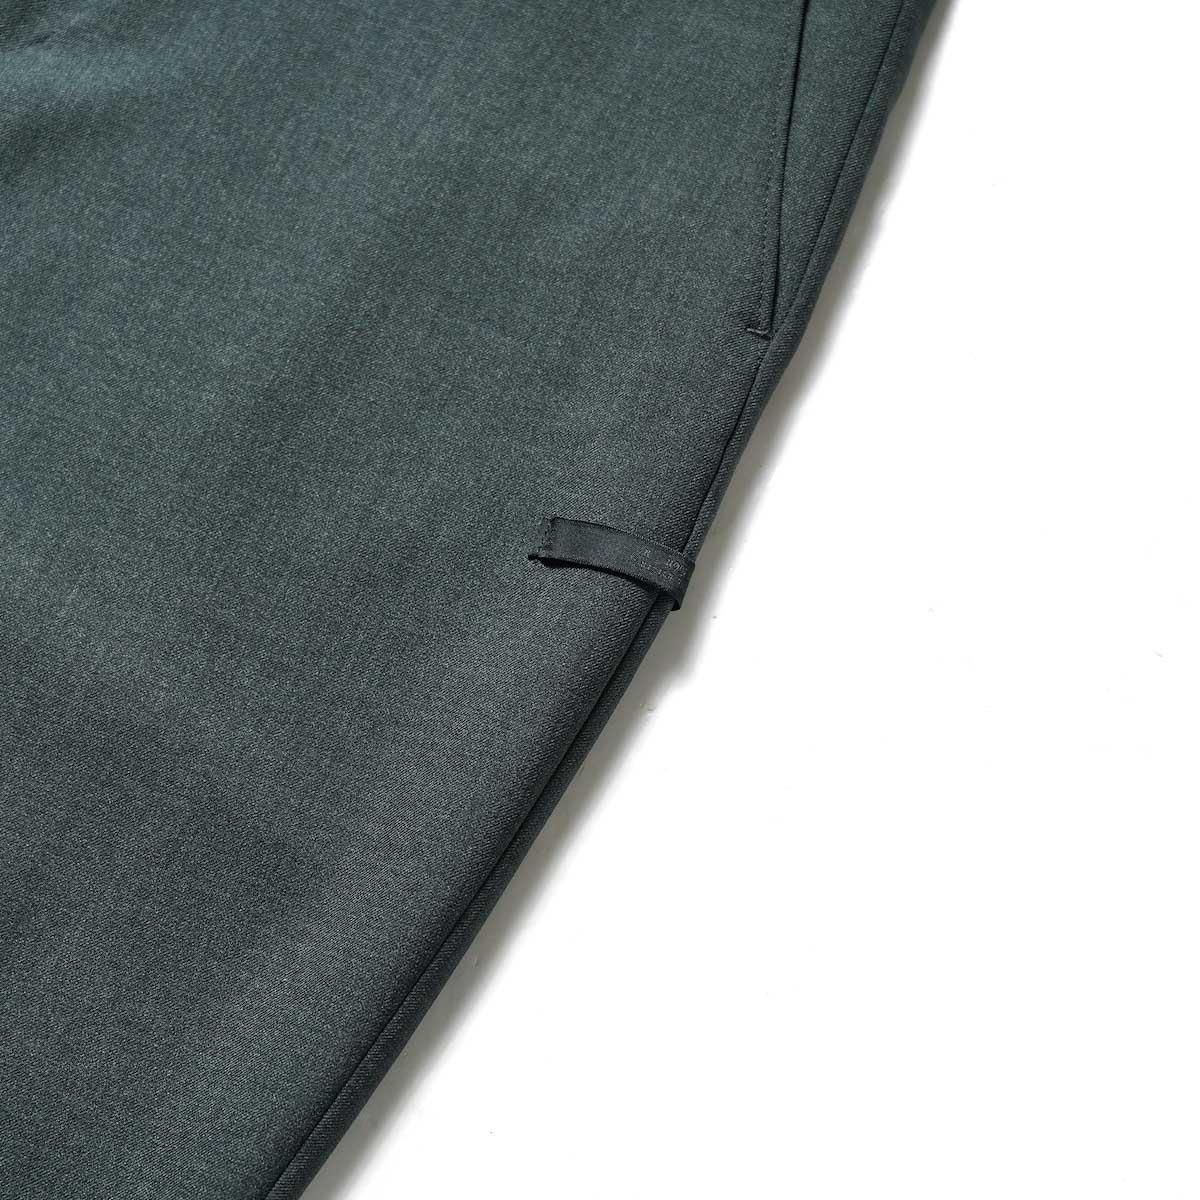 N.HOOLYWOOD / 2212-PT21-008 Flair Slacks (Charcoal)ネームタグ